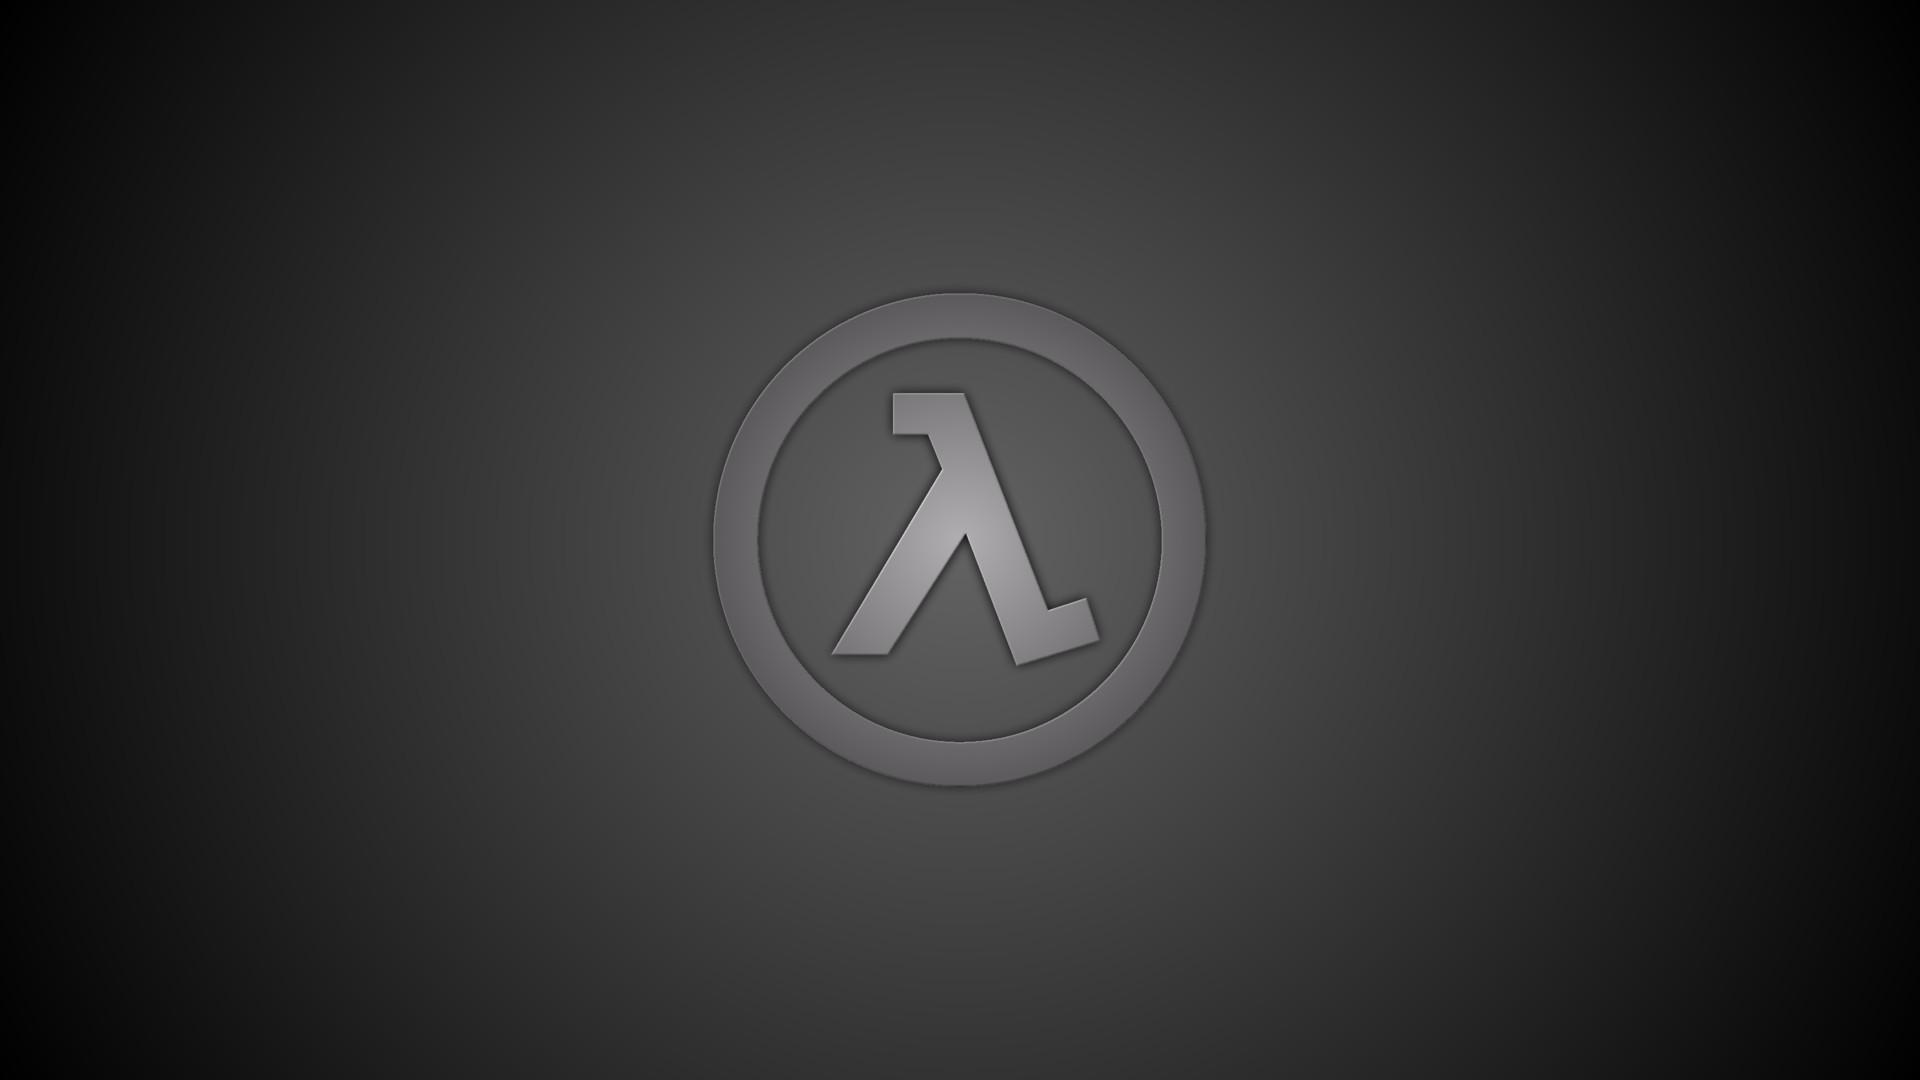 Black Mesa Emblems Half-Life Lambda Signs Valve Corporation Video Games …